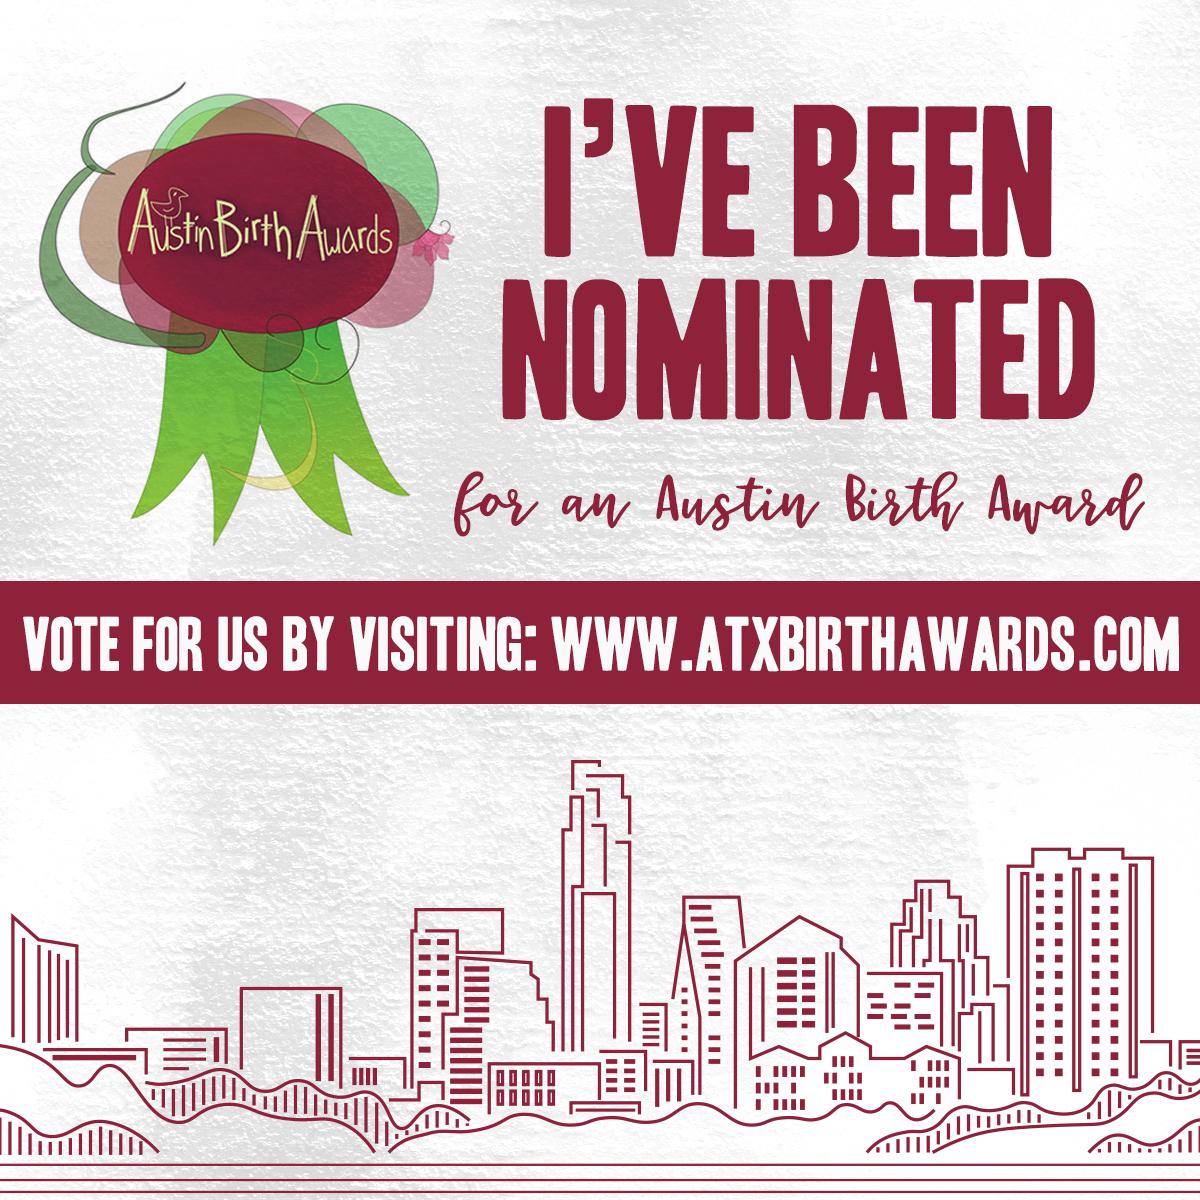 VoteForUs-BirthAwards.png